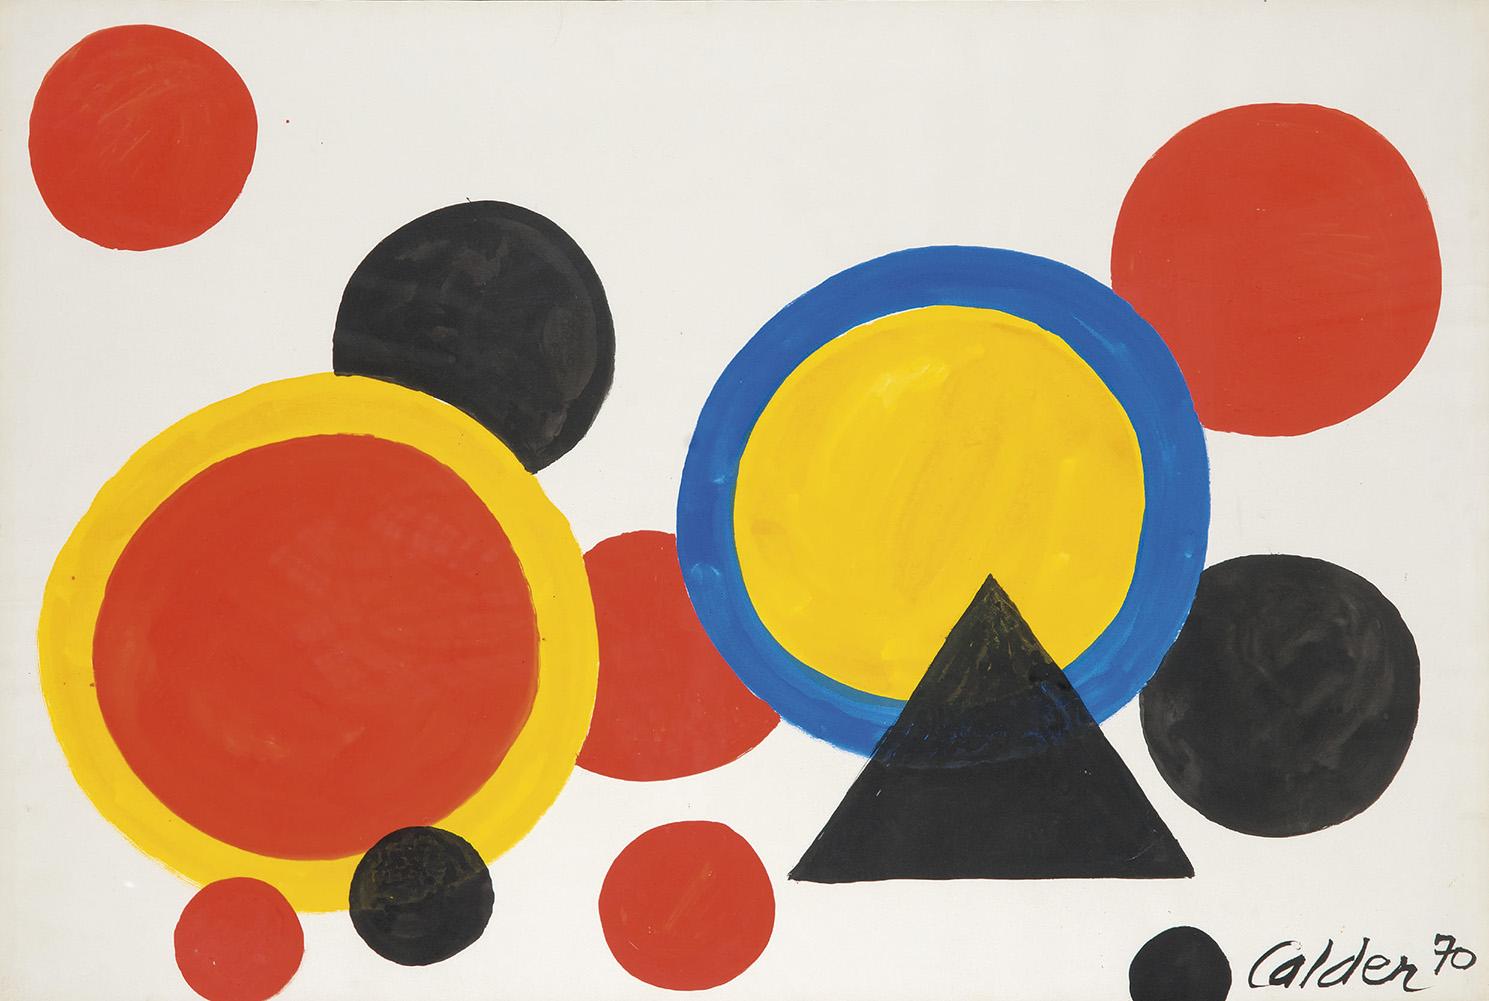 Alexander-Calder-Solaire-1970-Segre